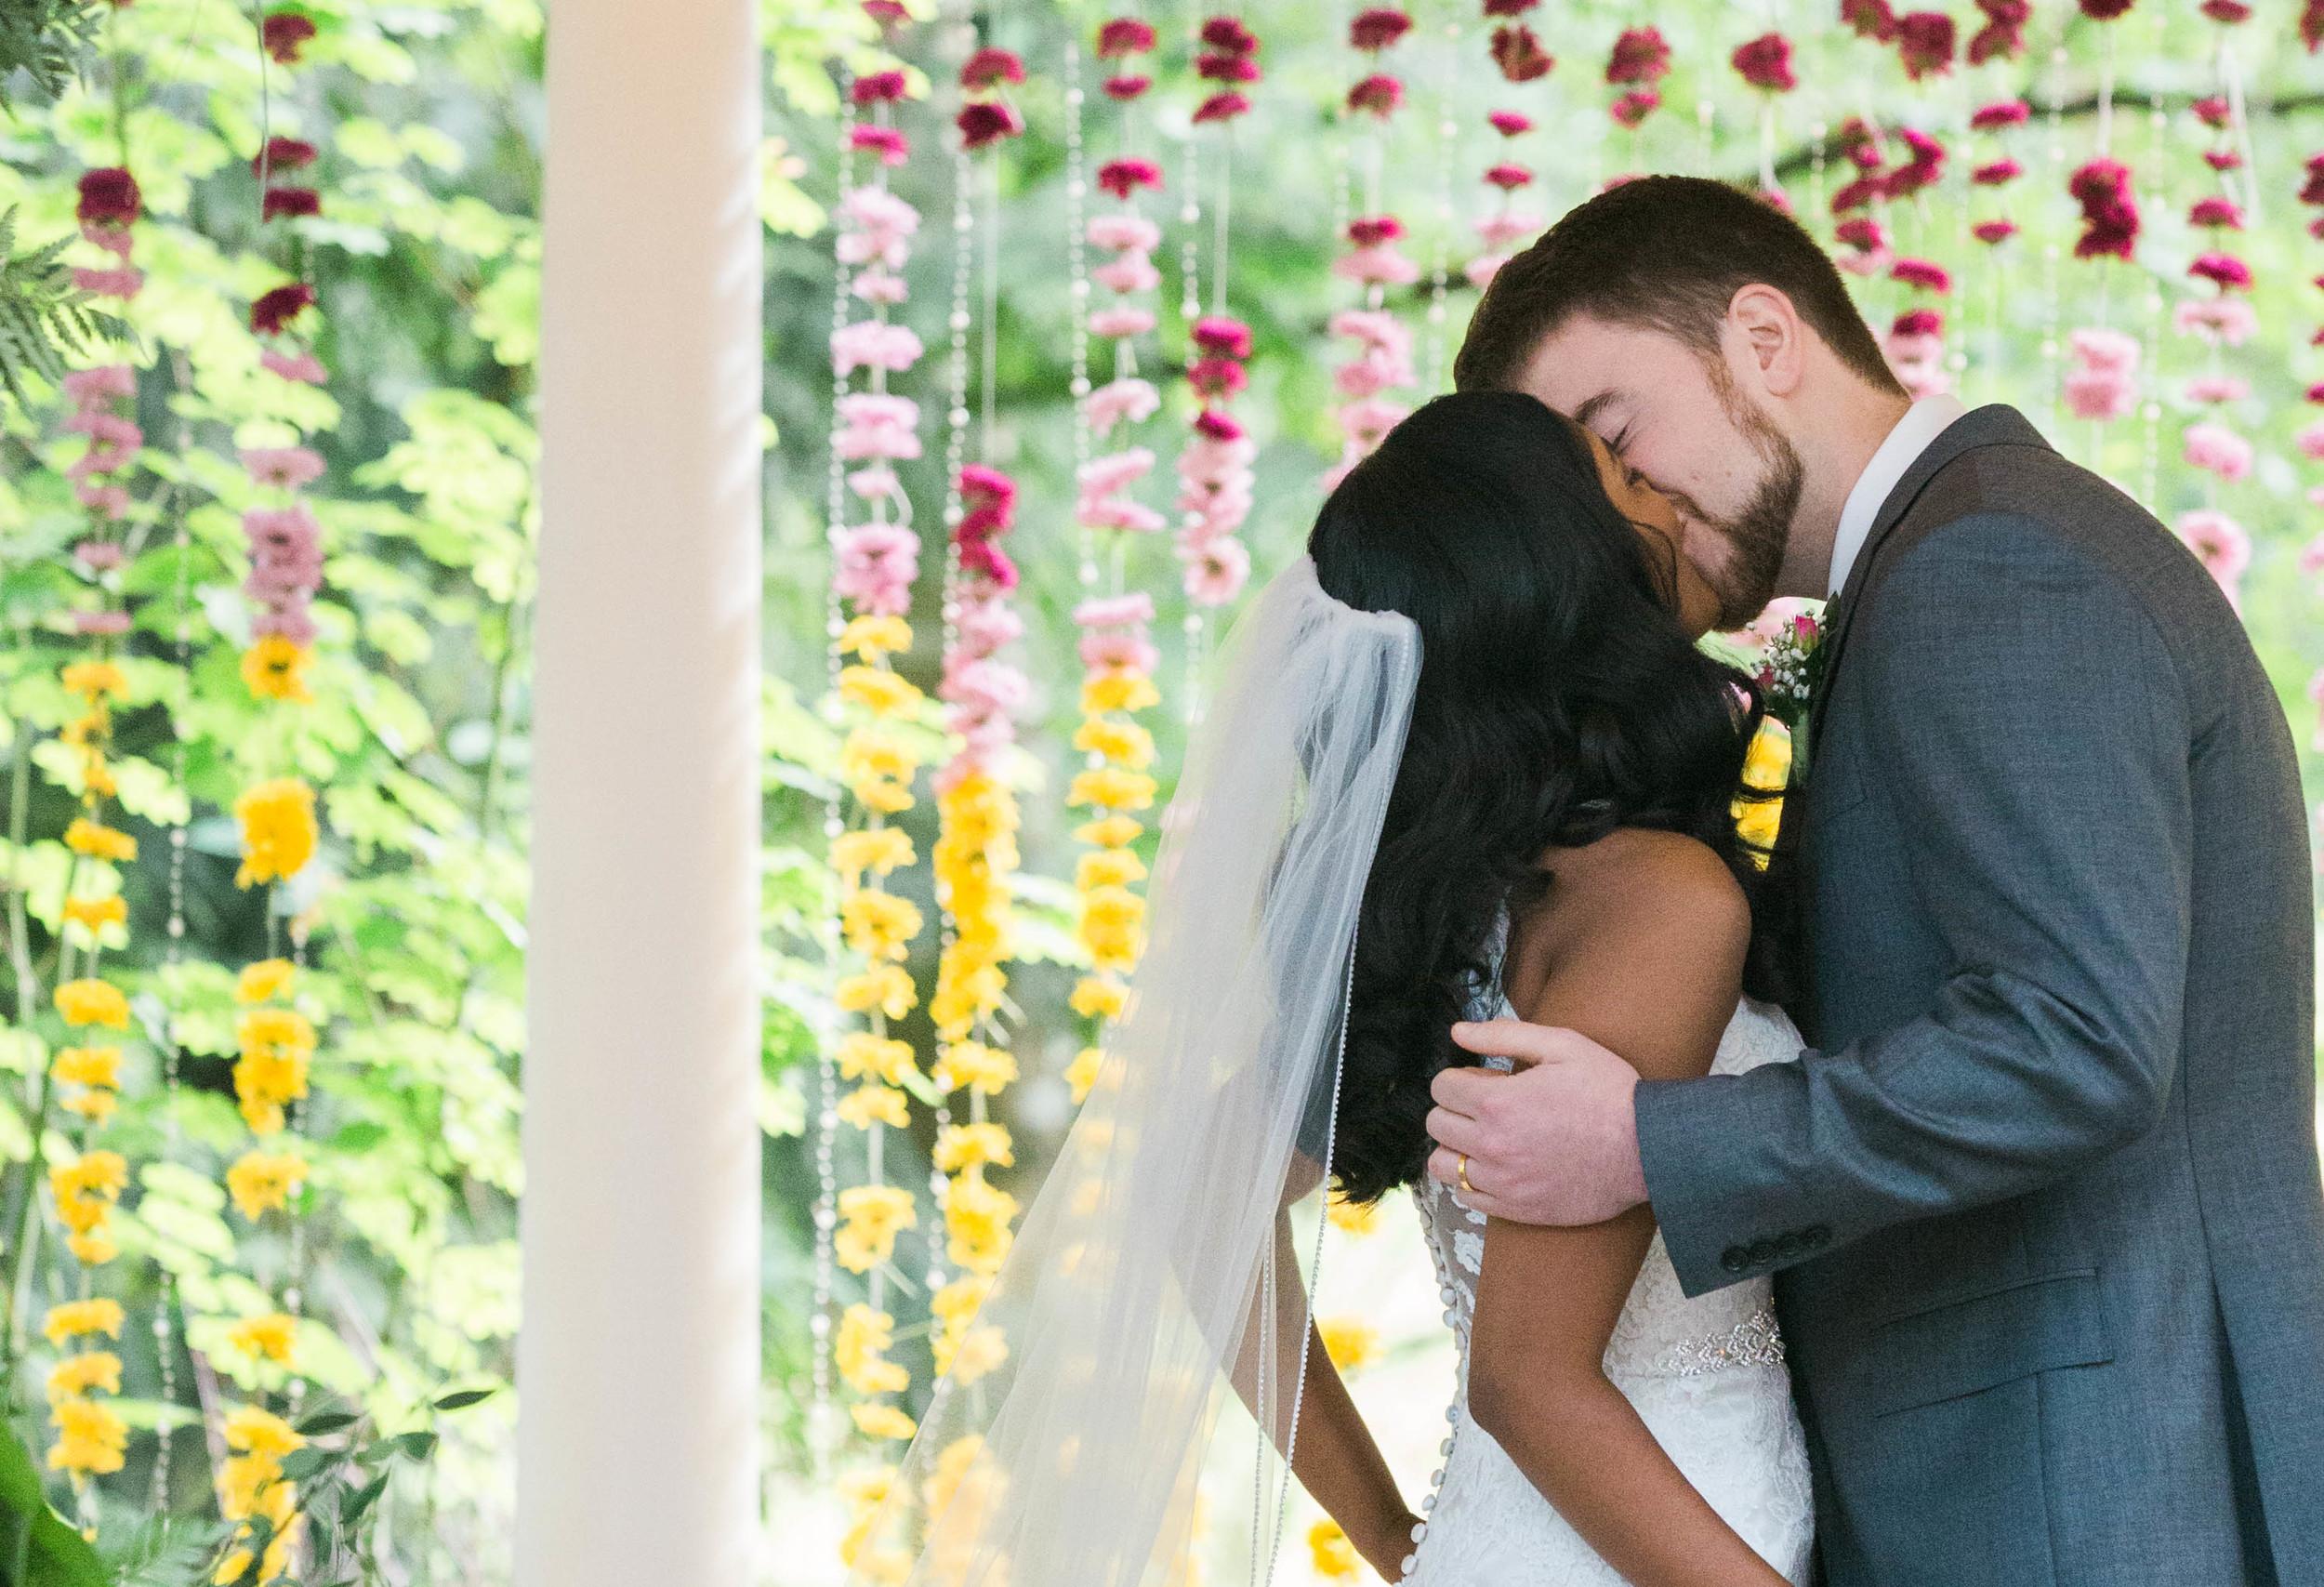 Hima+Dan_Wedding_Seattle+Couple_Kingston_6112016_1781.jpg